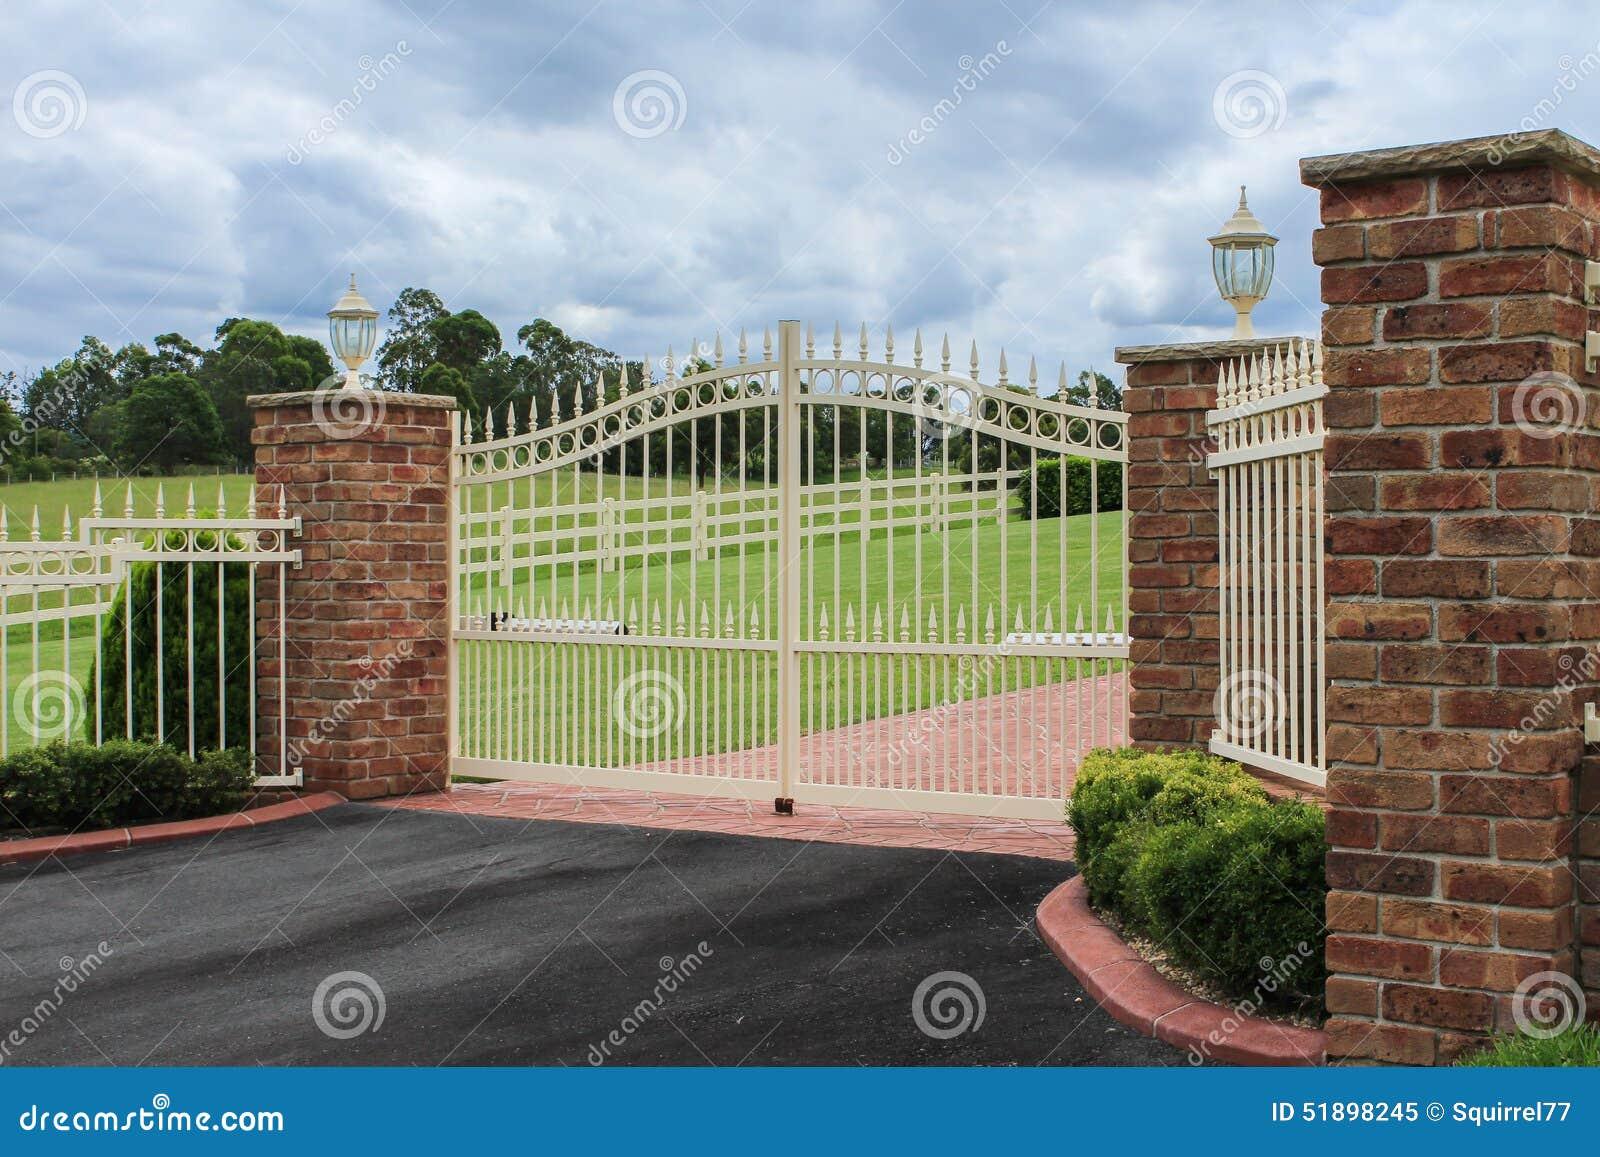 White Wrought Iron Driveway Entrance Gates Stock Image